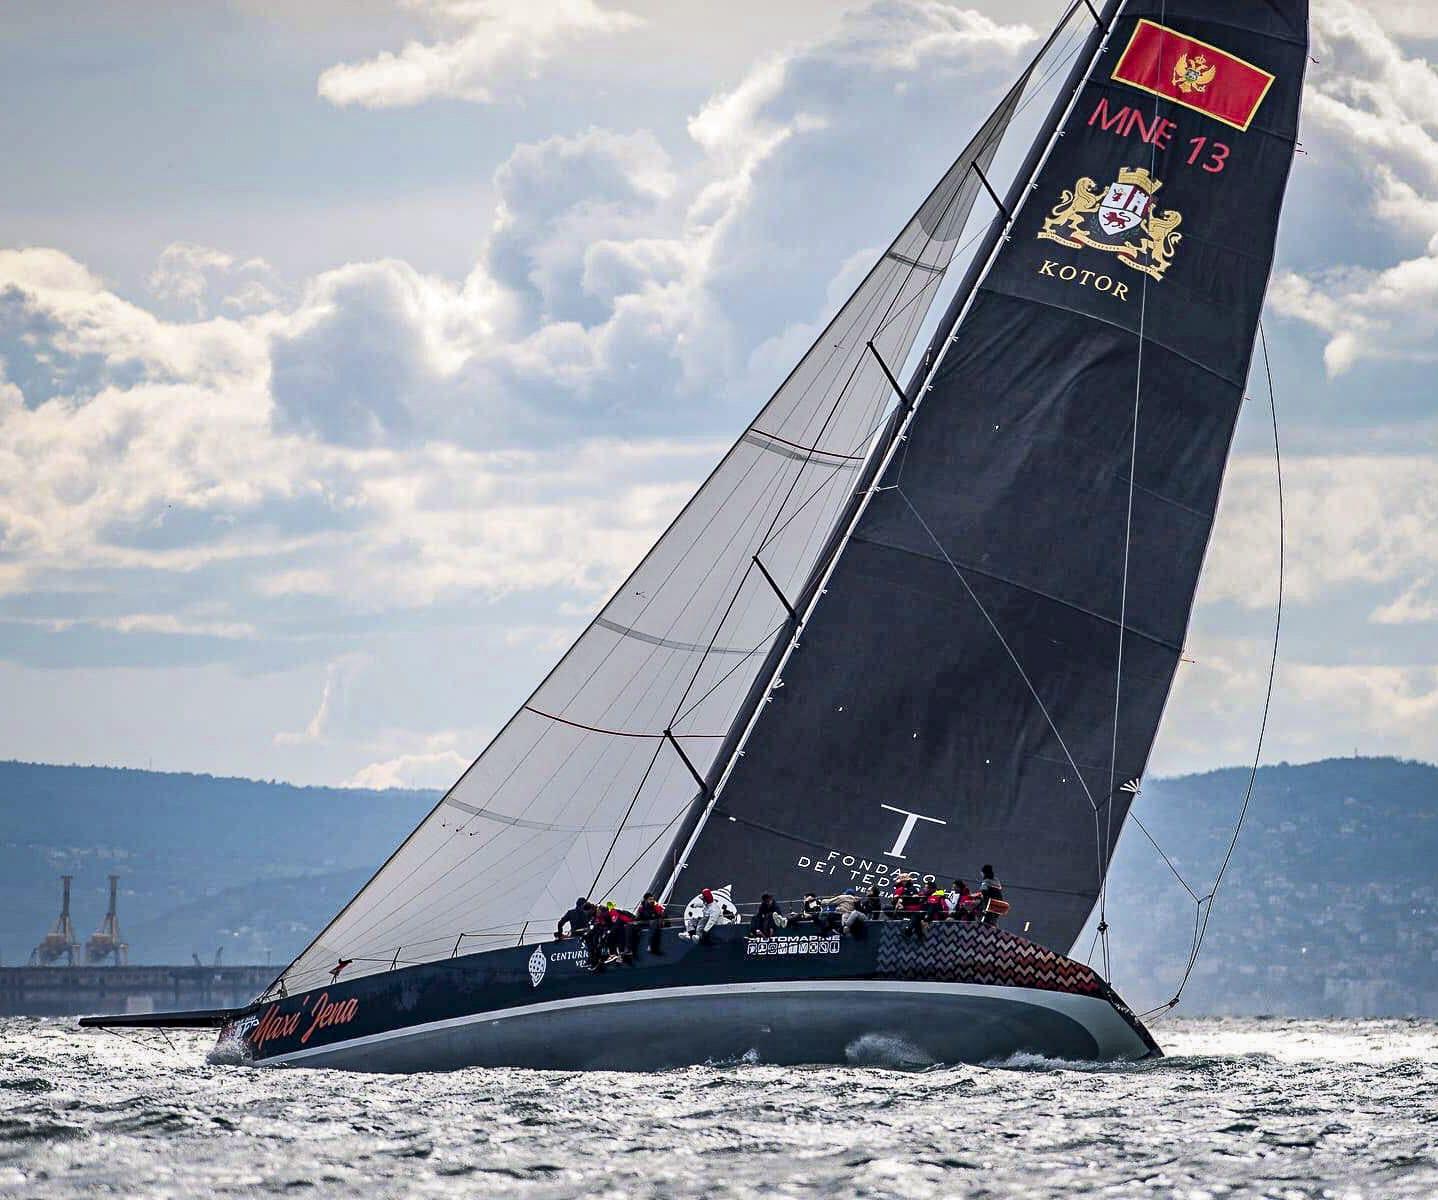 Maxi Jena impegnata alla Barcolana 53 - 2021